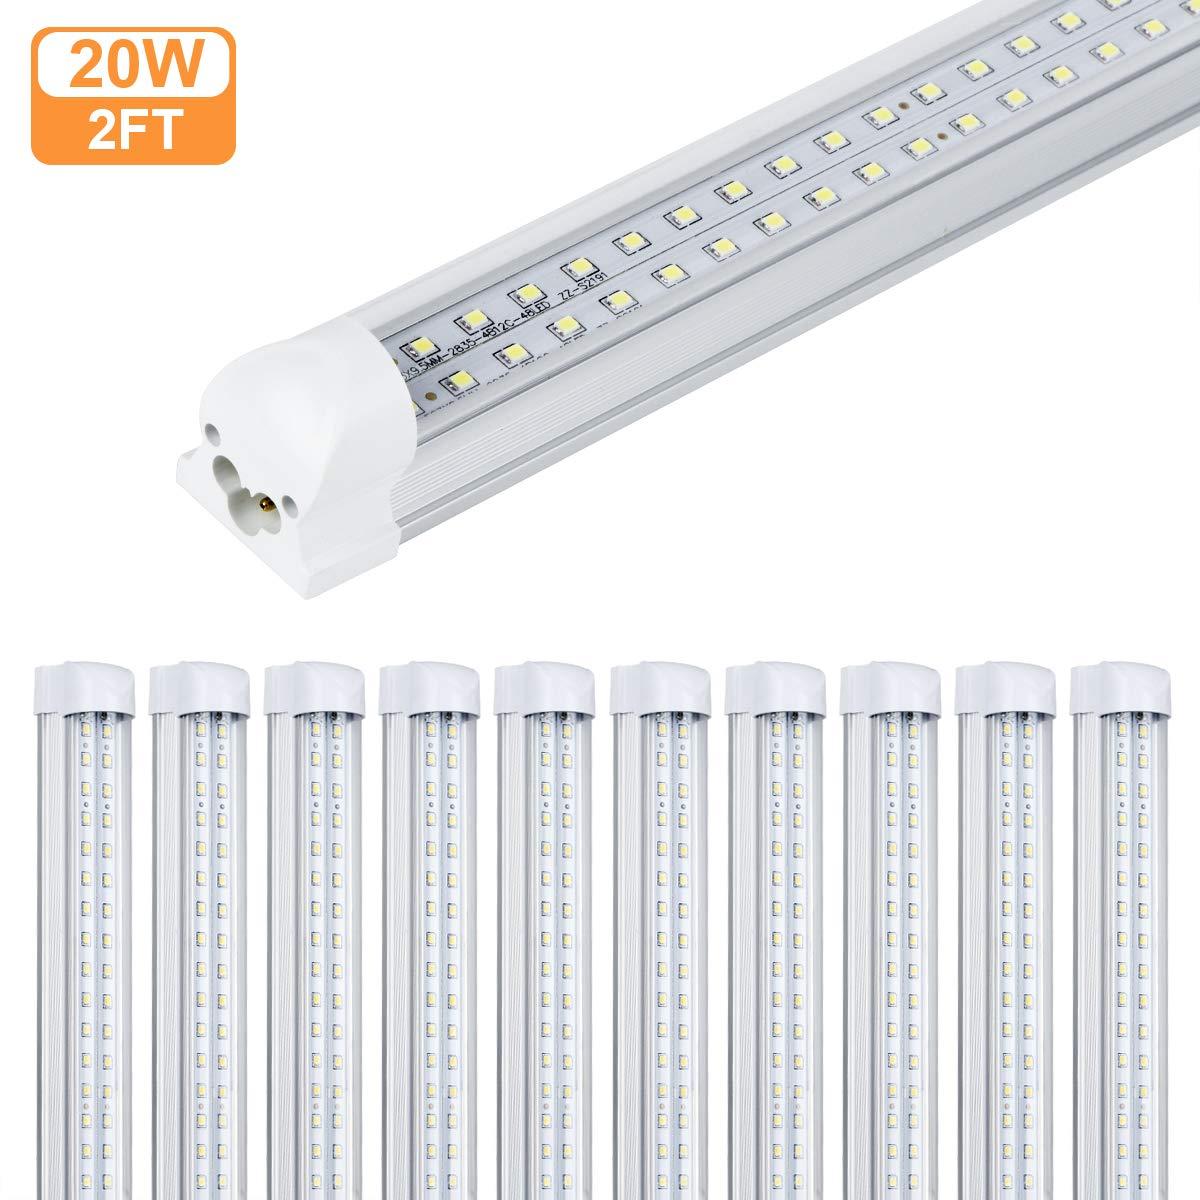 T8 LEDチューブライト 4-2FT-SP-CW- 6500k B07L66RKPJ